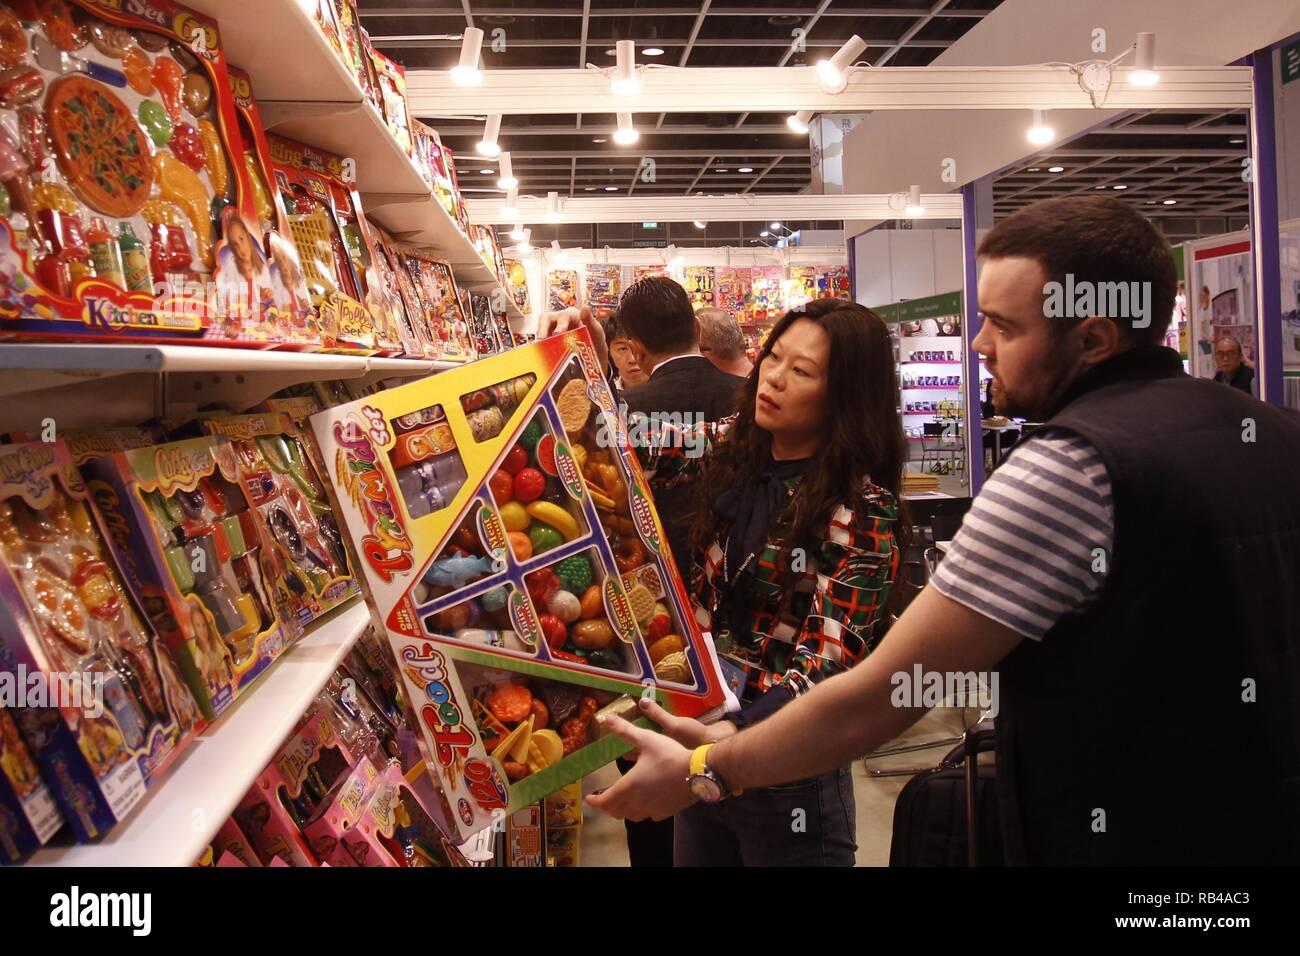 Hong Kong, CHINA. 7th Jan, 2019. Overseas buyer examines the product at the booth during 45th HK Toys & Games Fair.Jan-27, 2019 Hong Kong.ZUMA/Liau Chung-ren Credit: Liau Chung-ren/ZUMA Wire/Alamy Live News Stock Photo